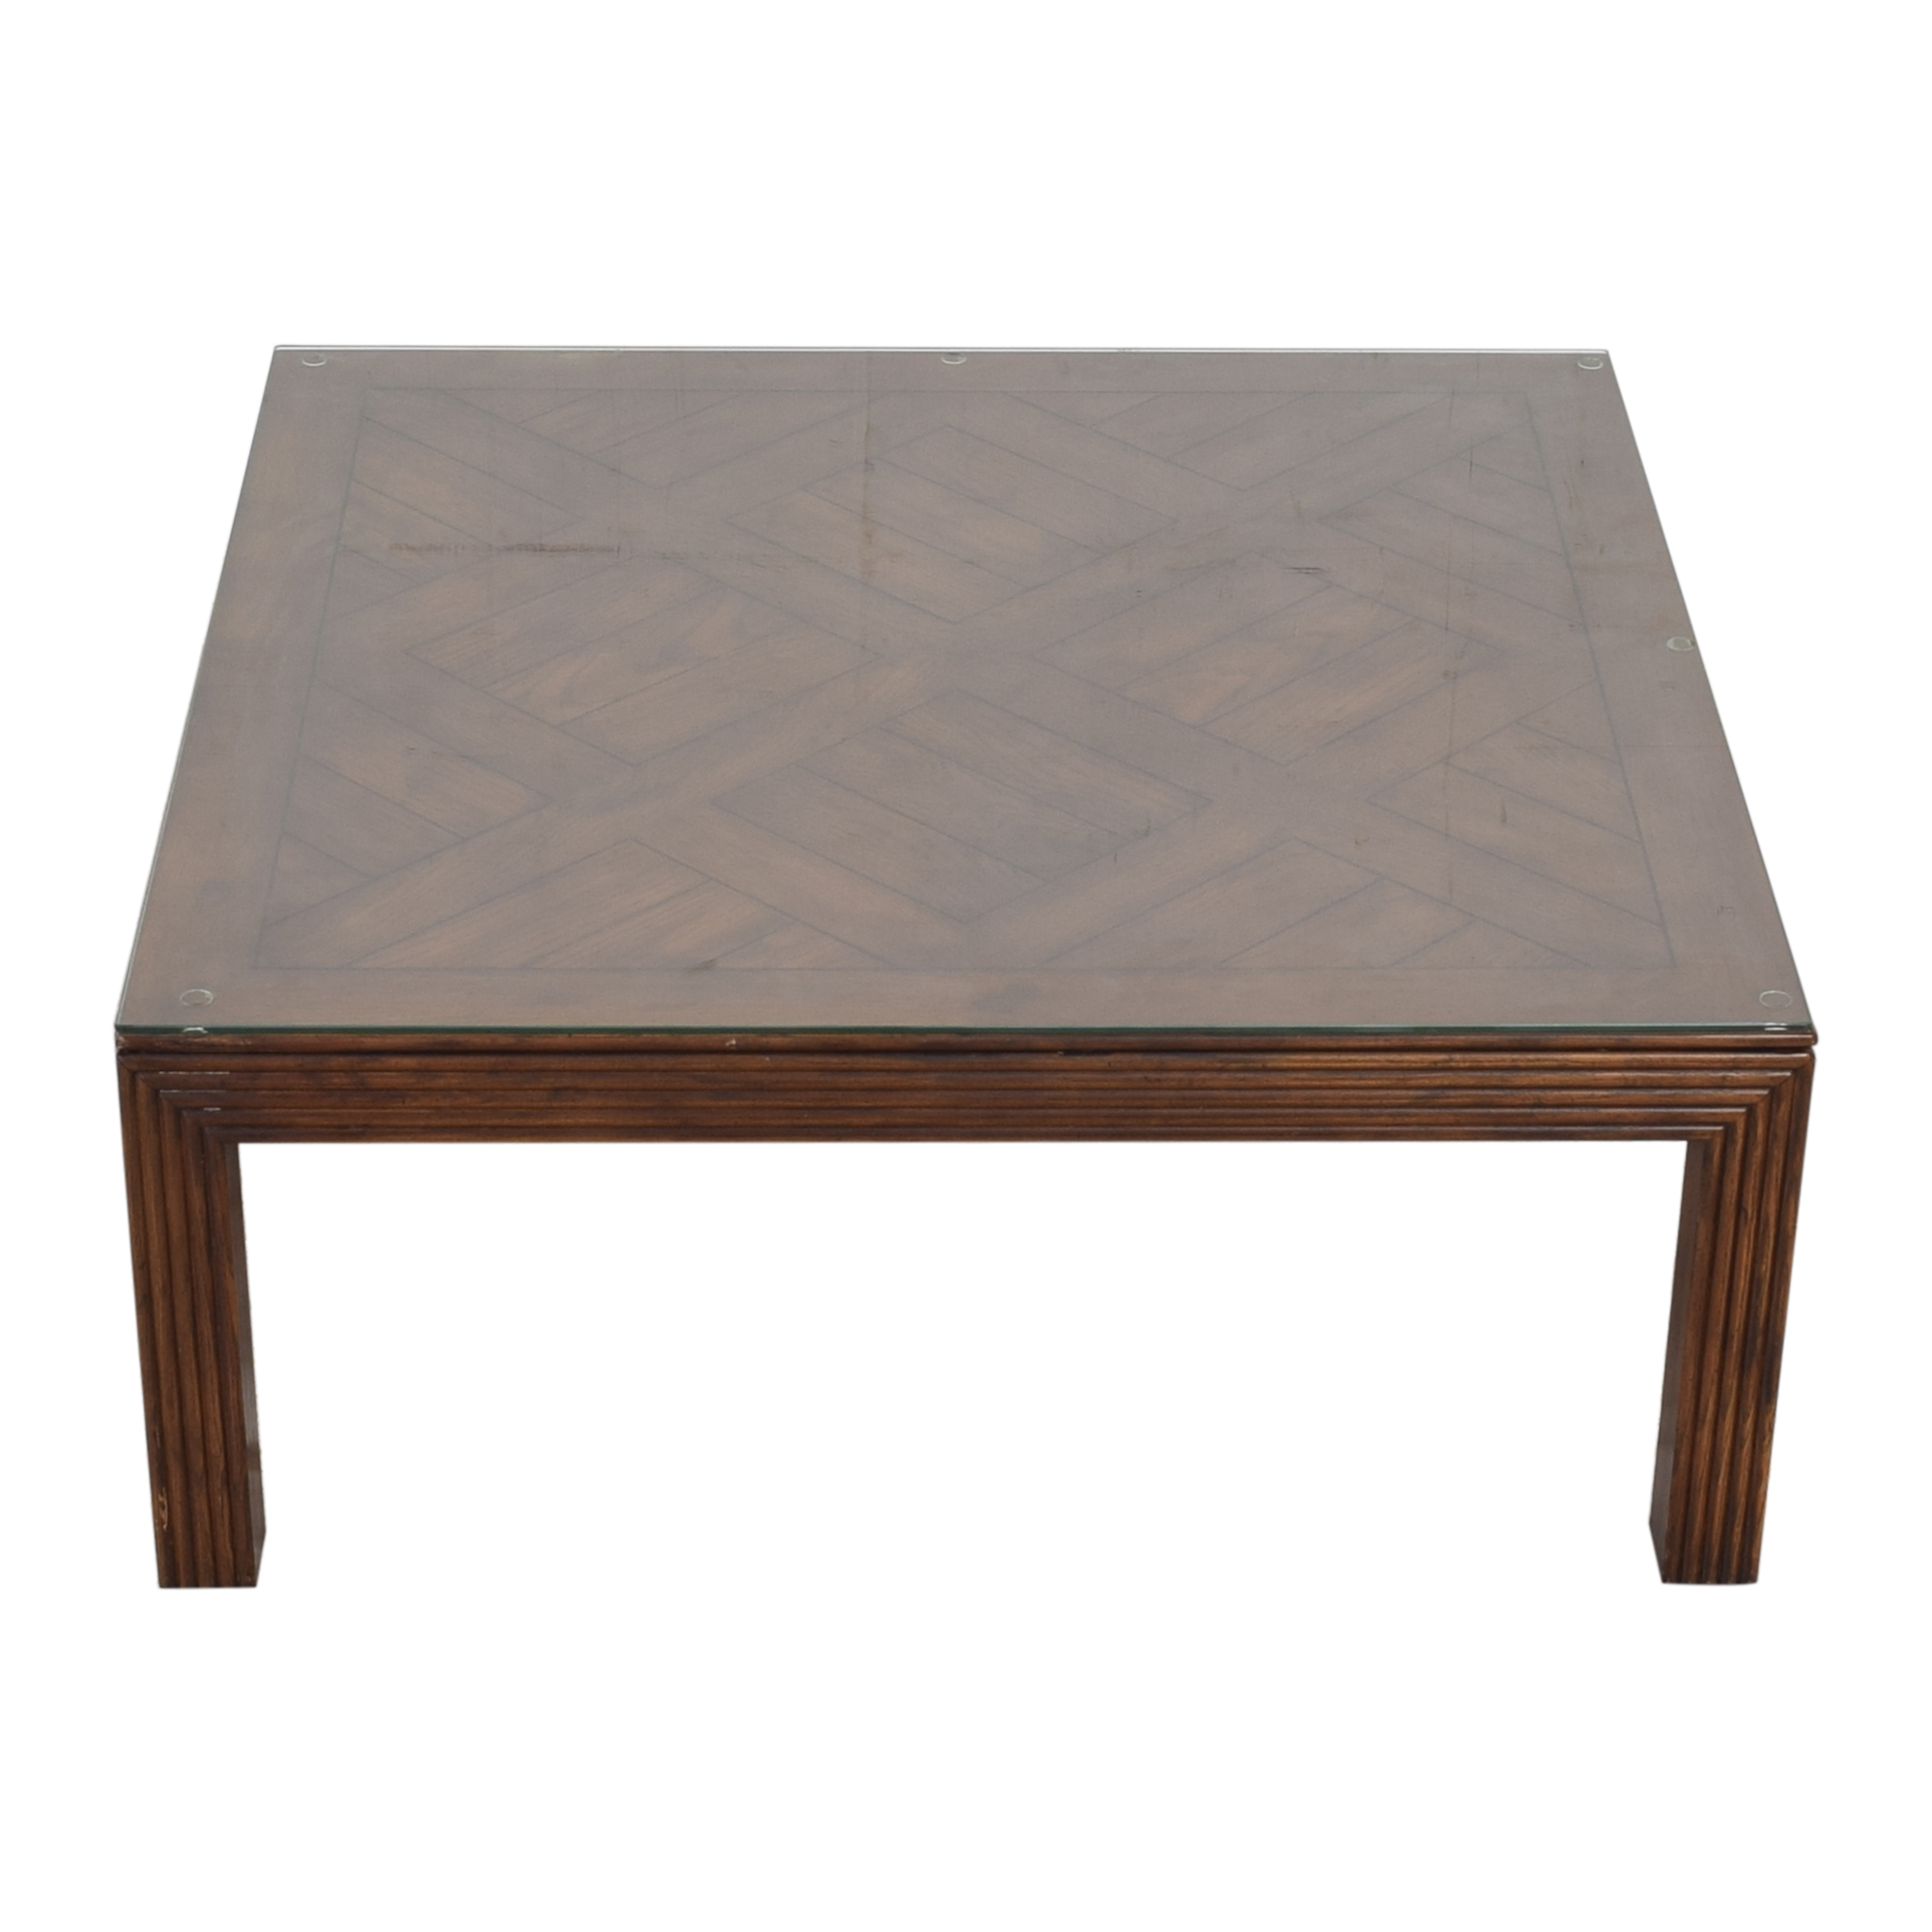 buy Henredon Furniture Square Coffee Table Henredon Furniture Coffee Tables